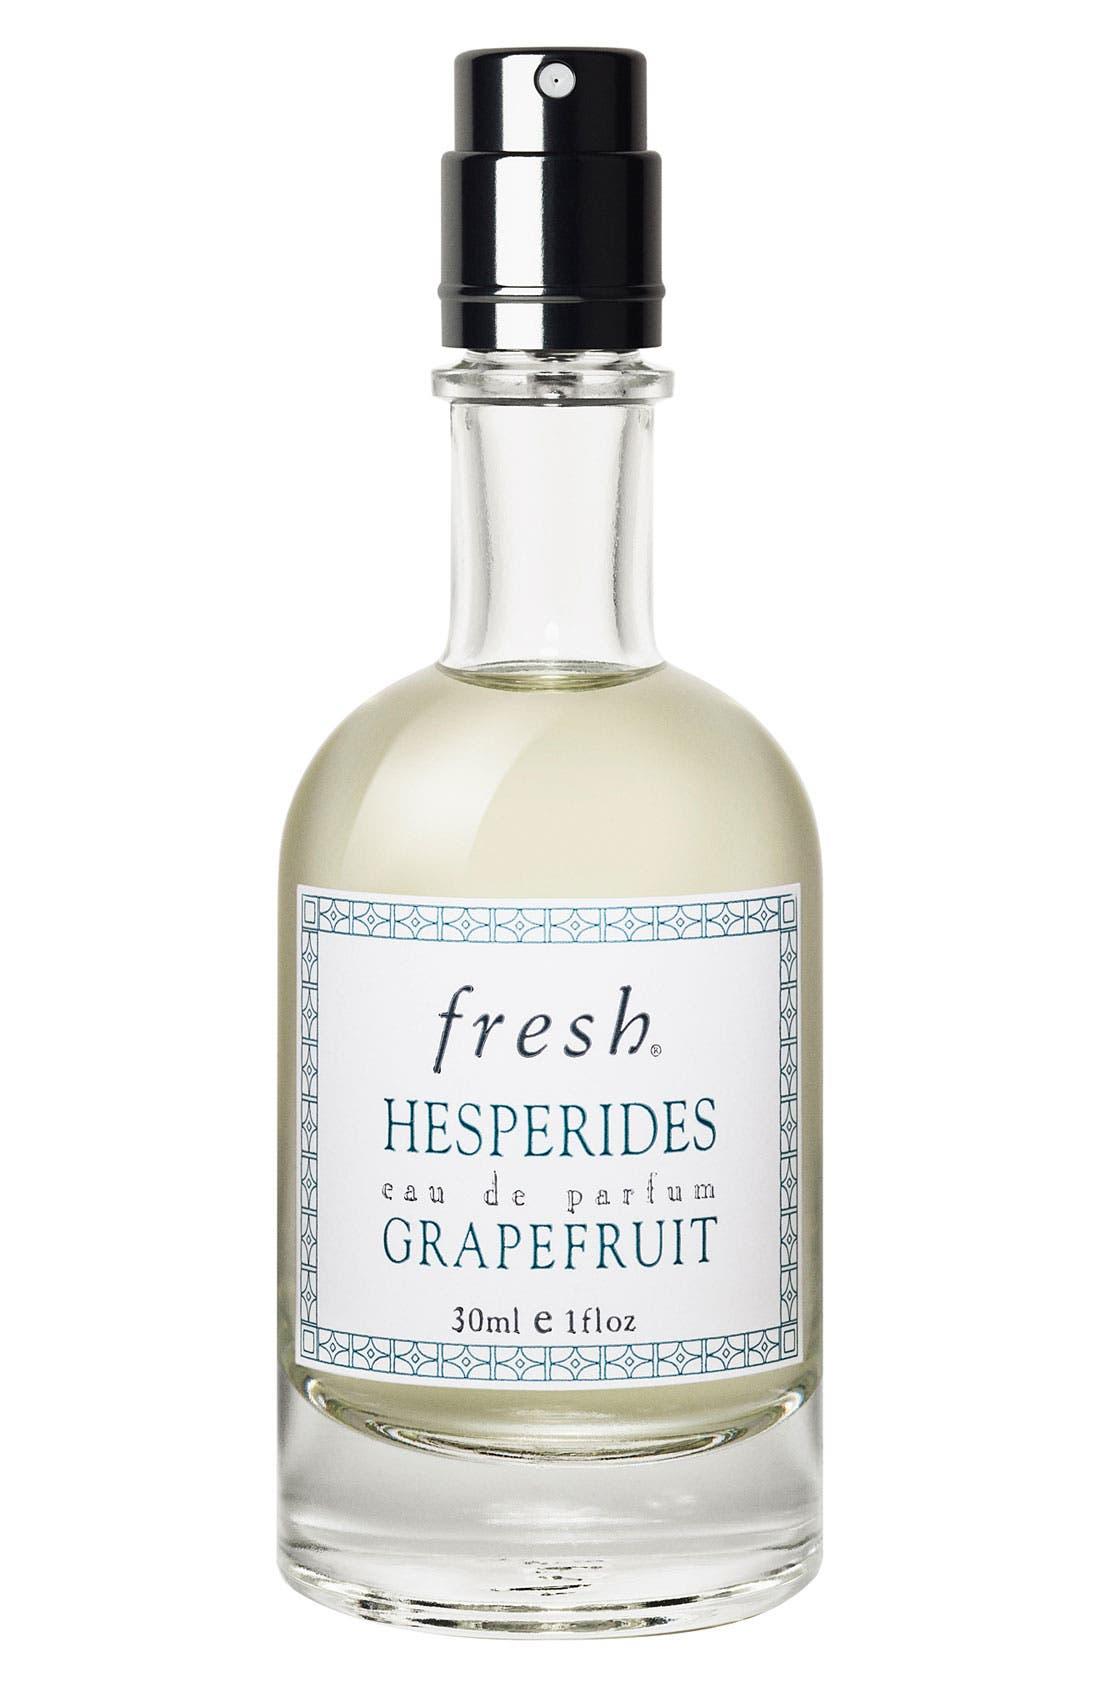 Fresh Hesperides Grapefruit Eau De Parfum